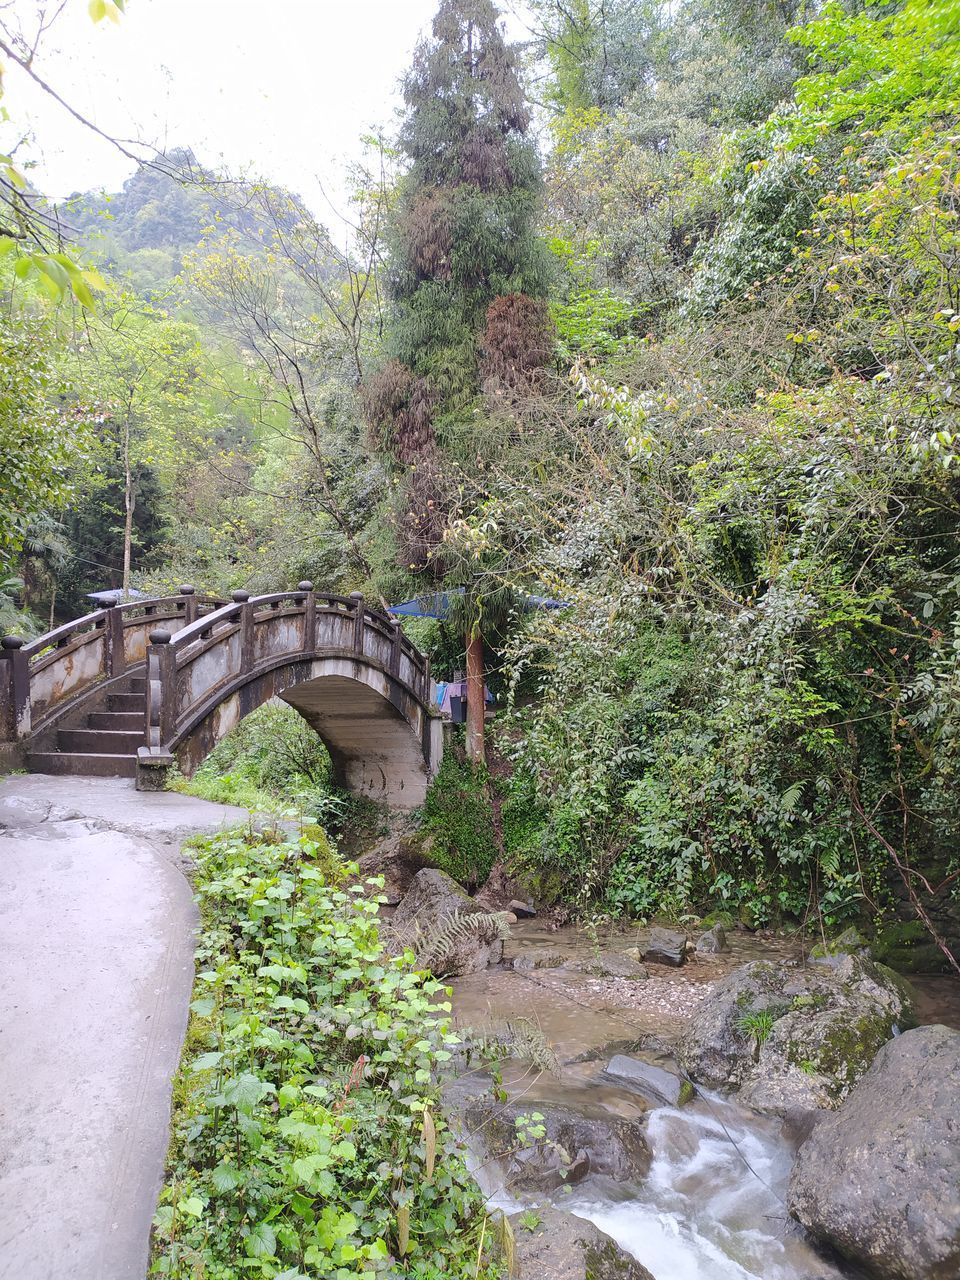 ARCH BRIDGE OVER RIVER STREAM IN FOREST